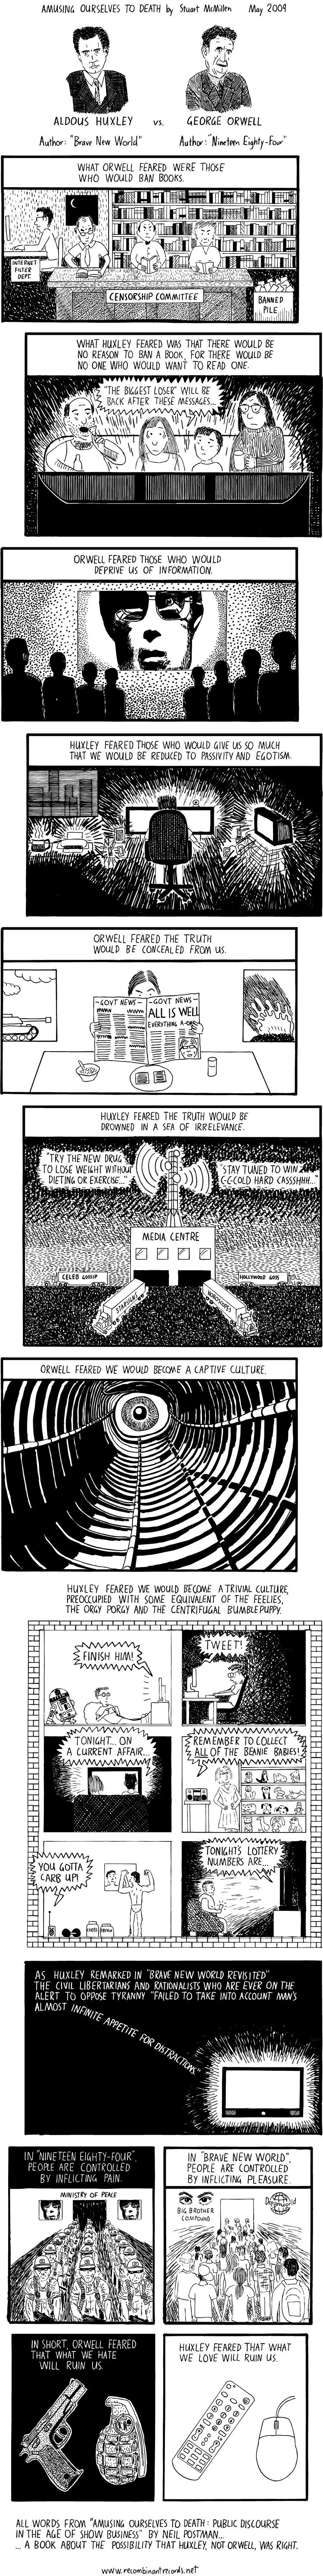 stuart_mcmillen huxley vs orwell compleet